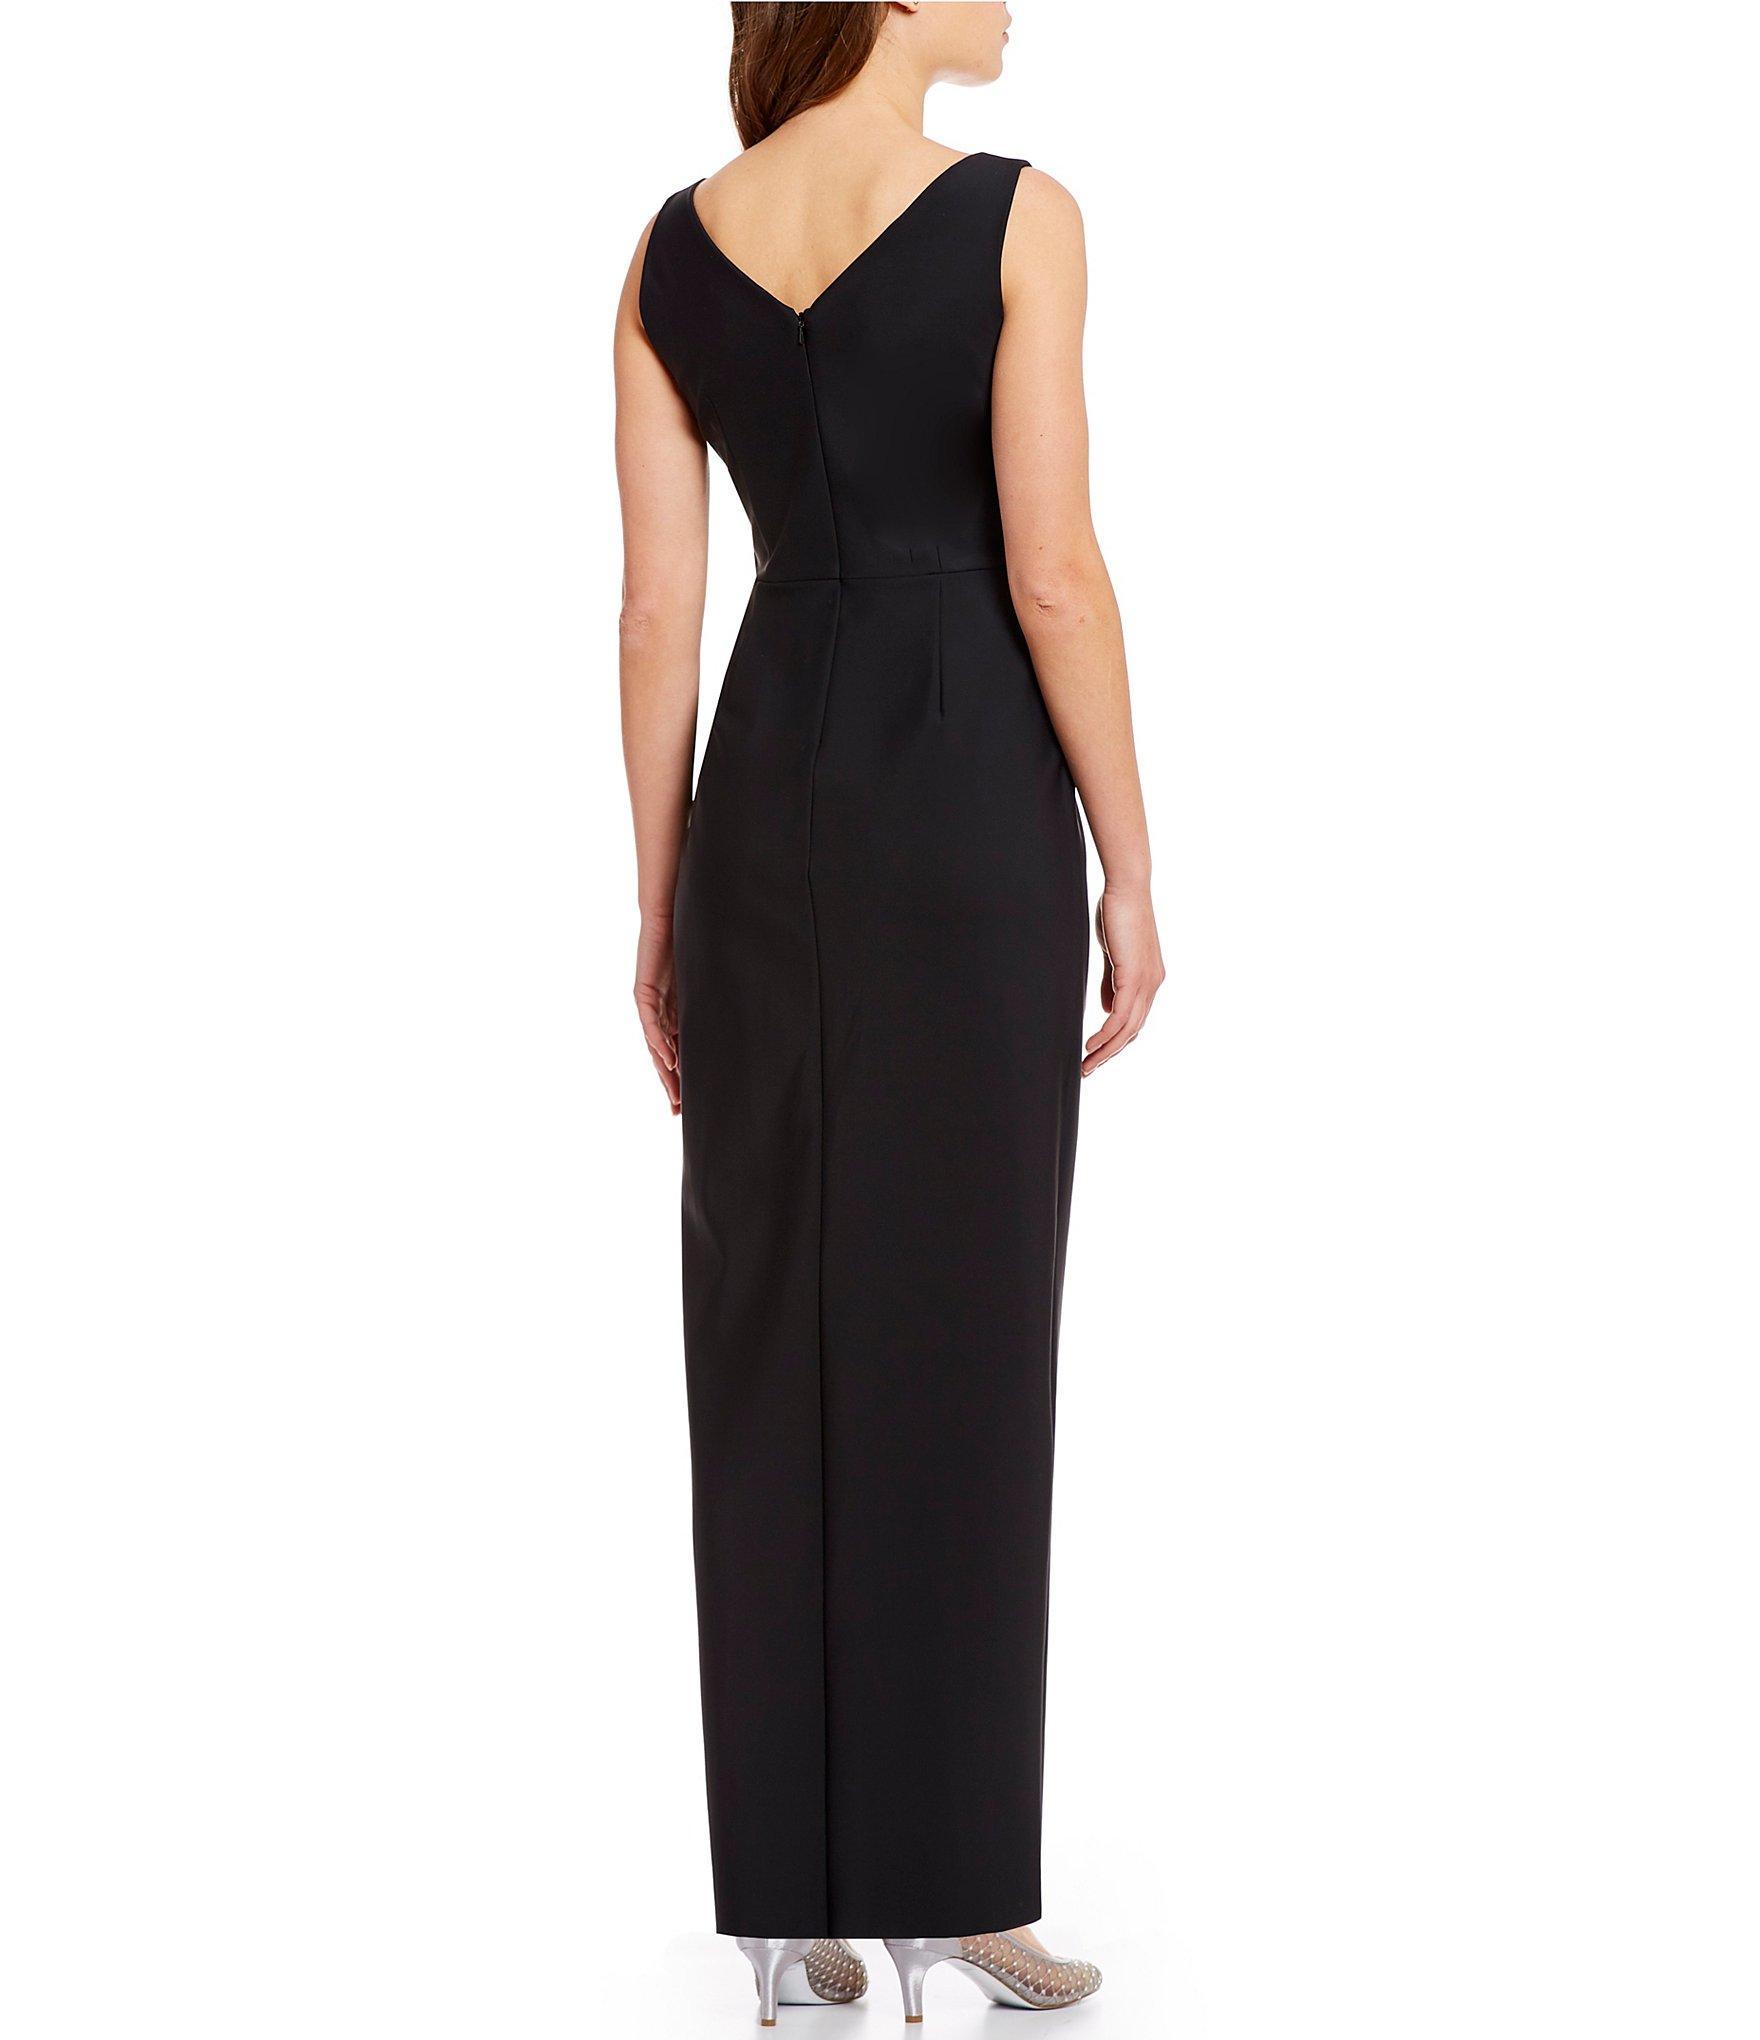 3ab8d5b1738c3 Alex Evenings - Black Sleeveless Surplice Neckline Beaded Detail Sheath  Dress - Lyst. View fullscreen